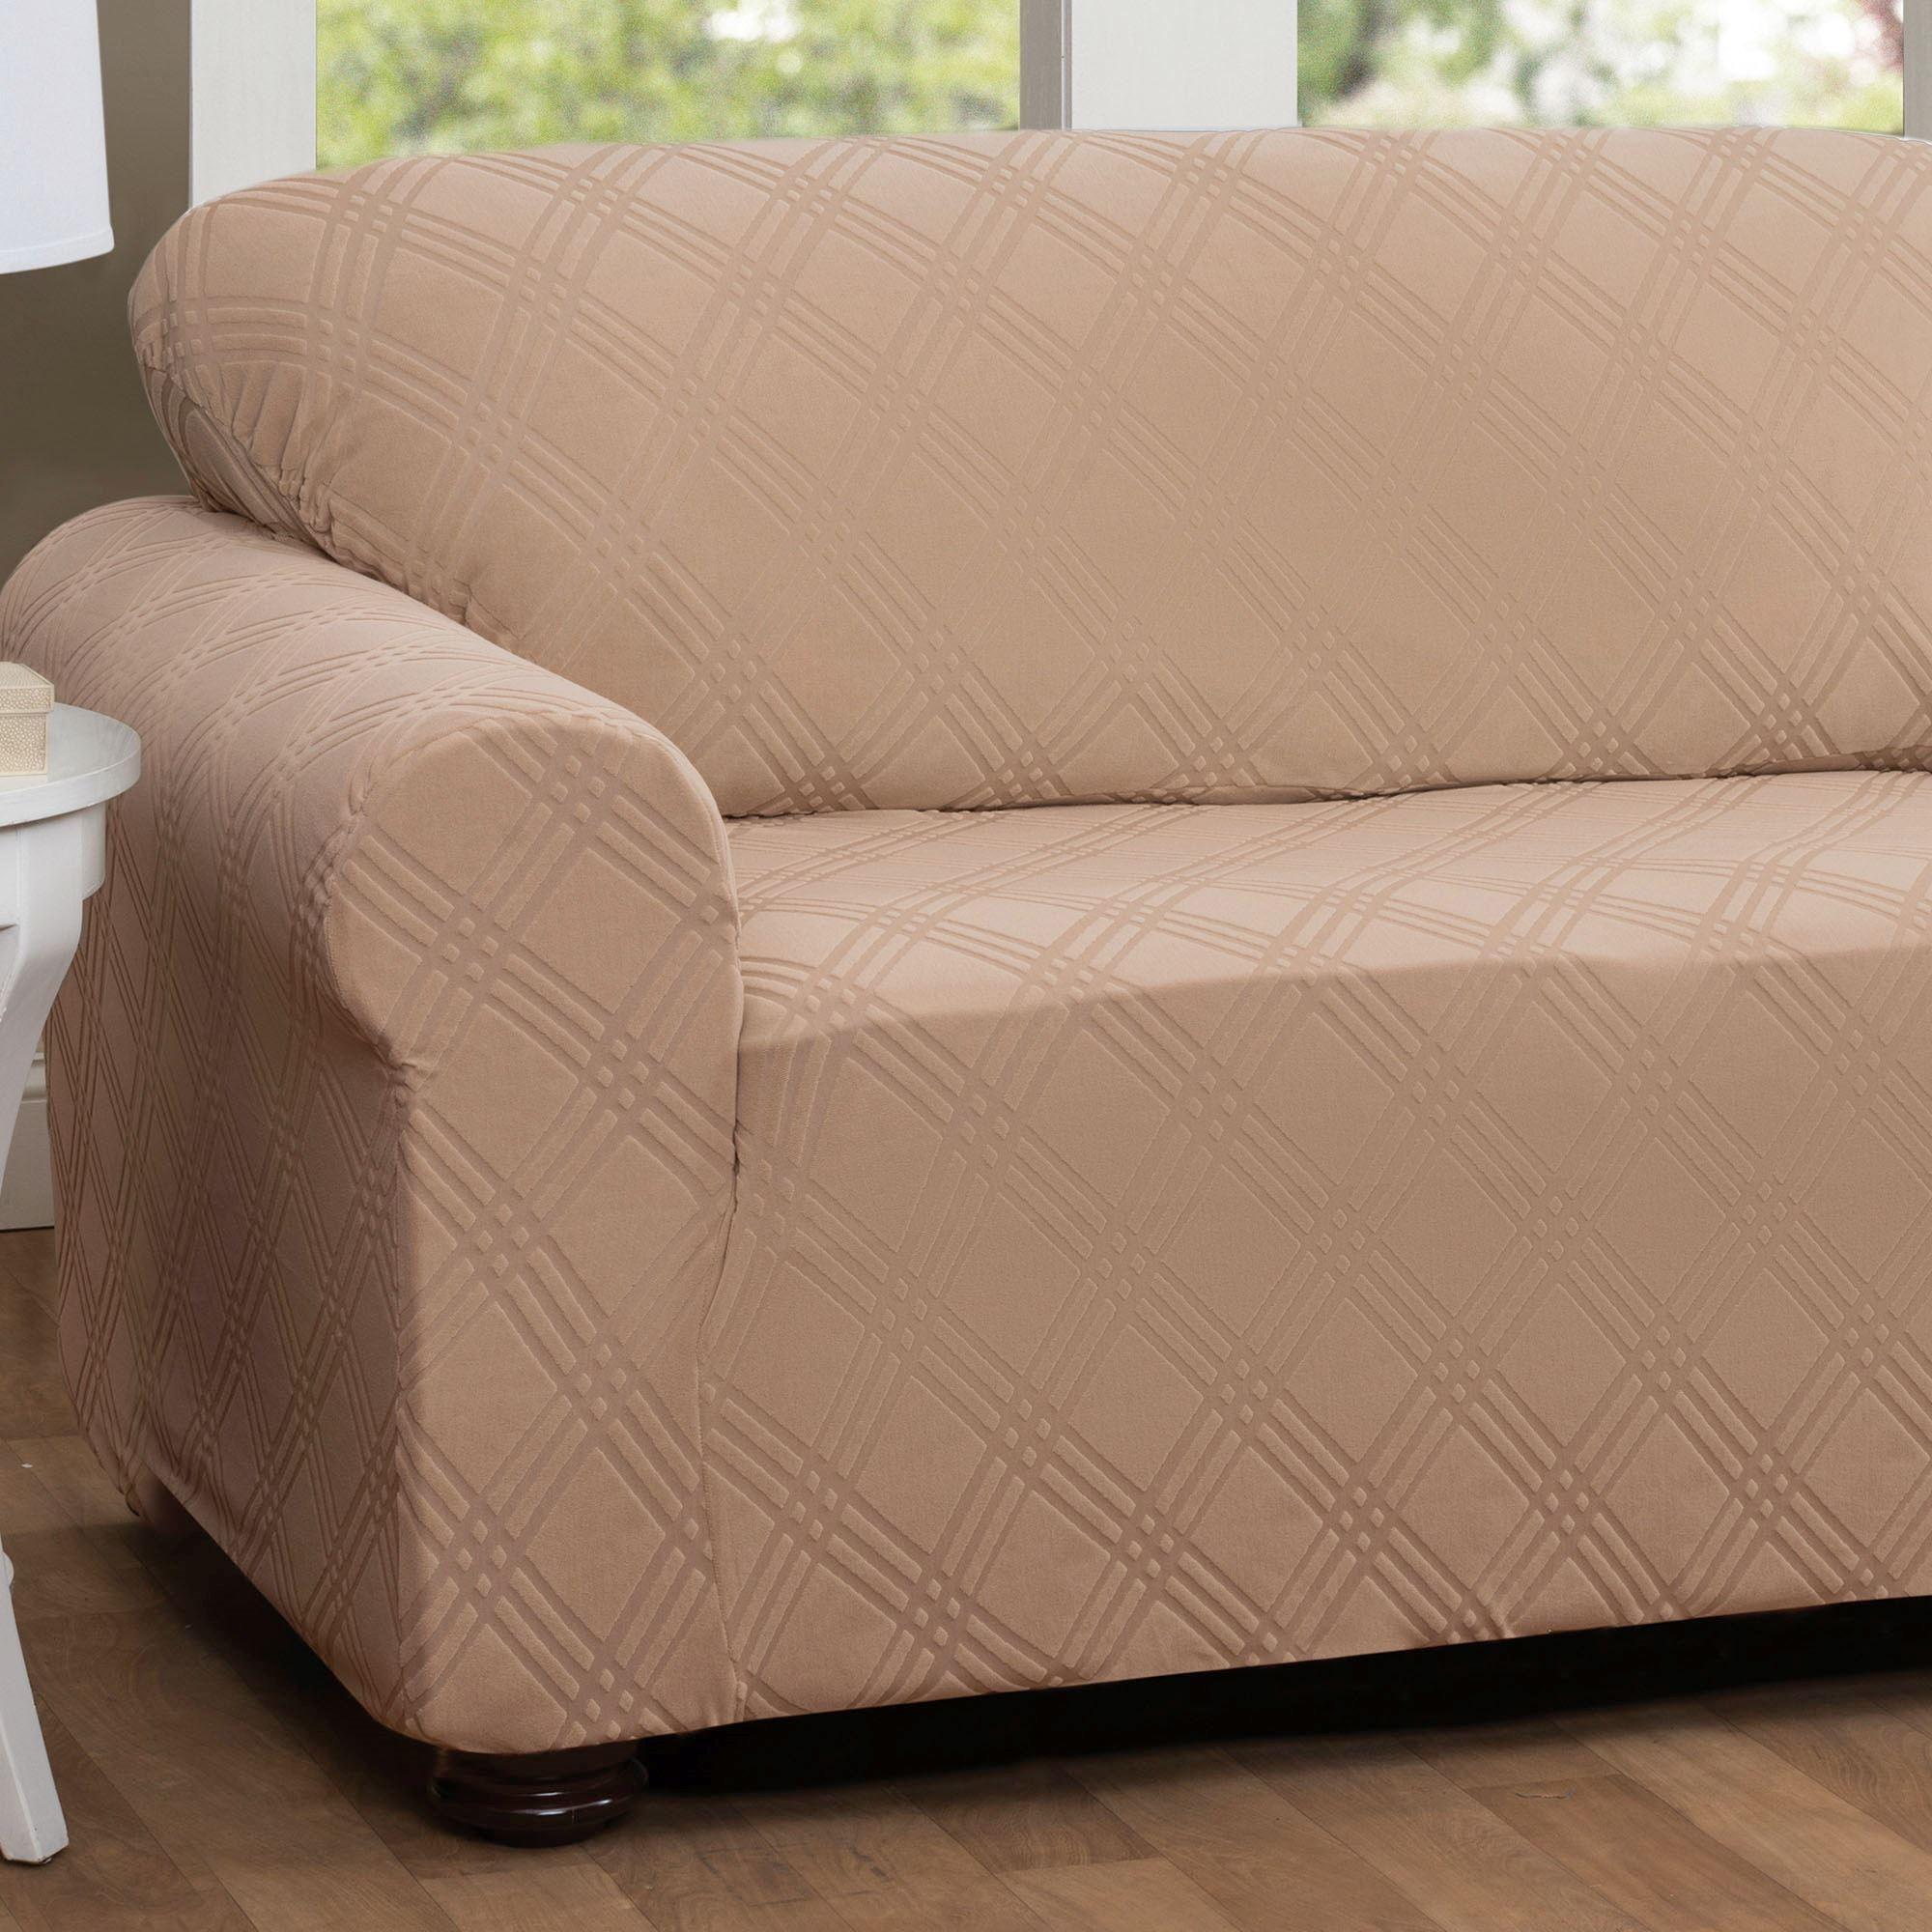 navy sofa cover sleeper under 300 20 inspirations blue slipcovers ideas